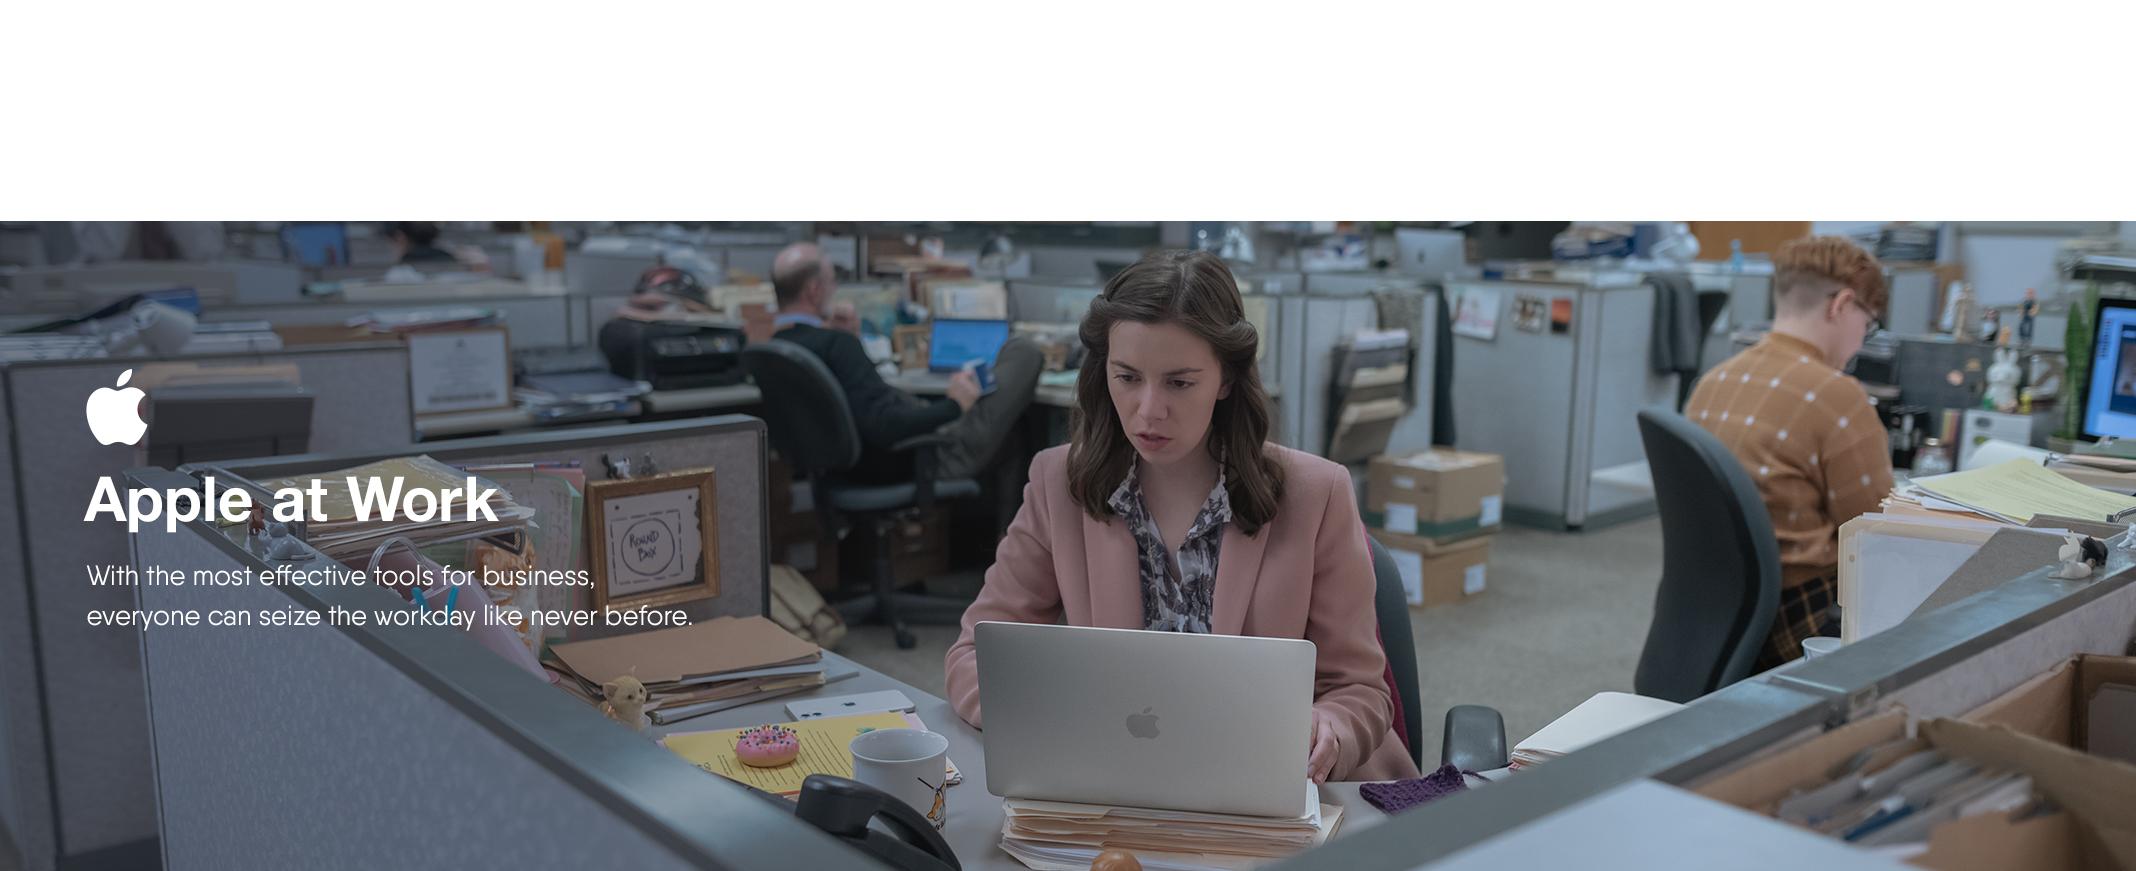 Apple at work arkphire apple authorised enterprise reseller